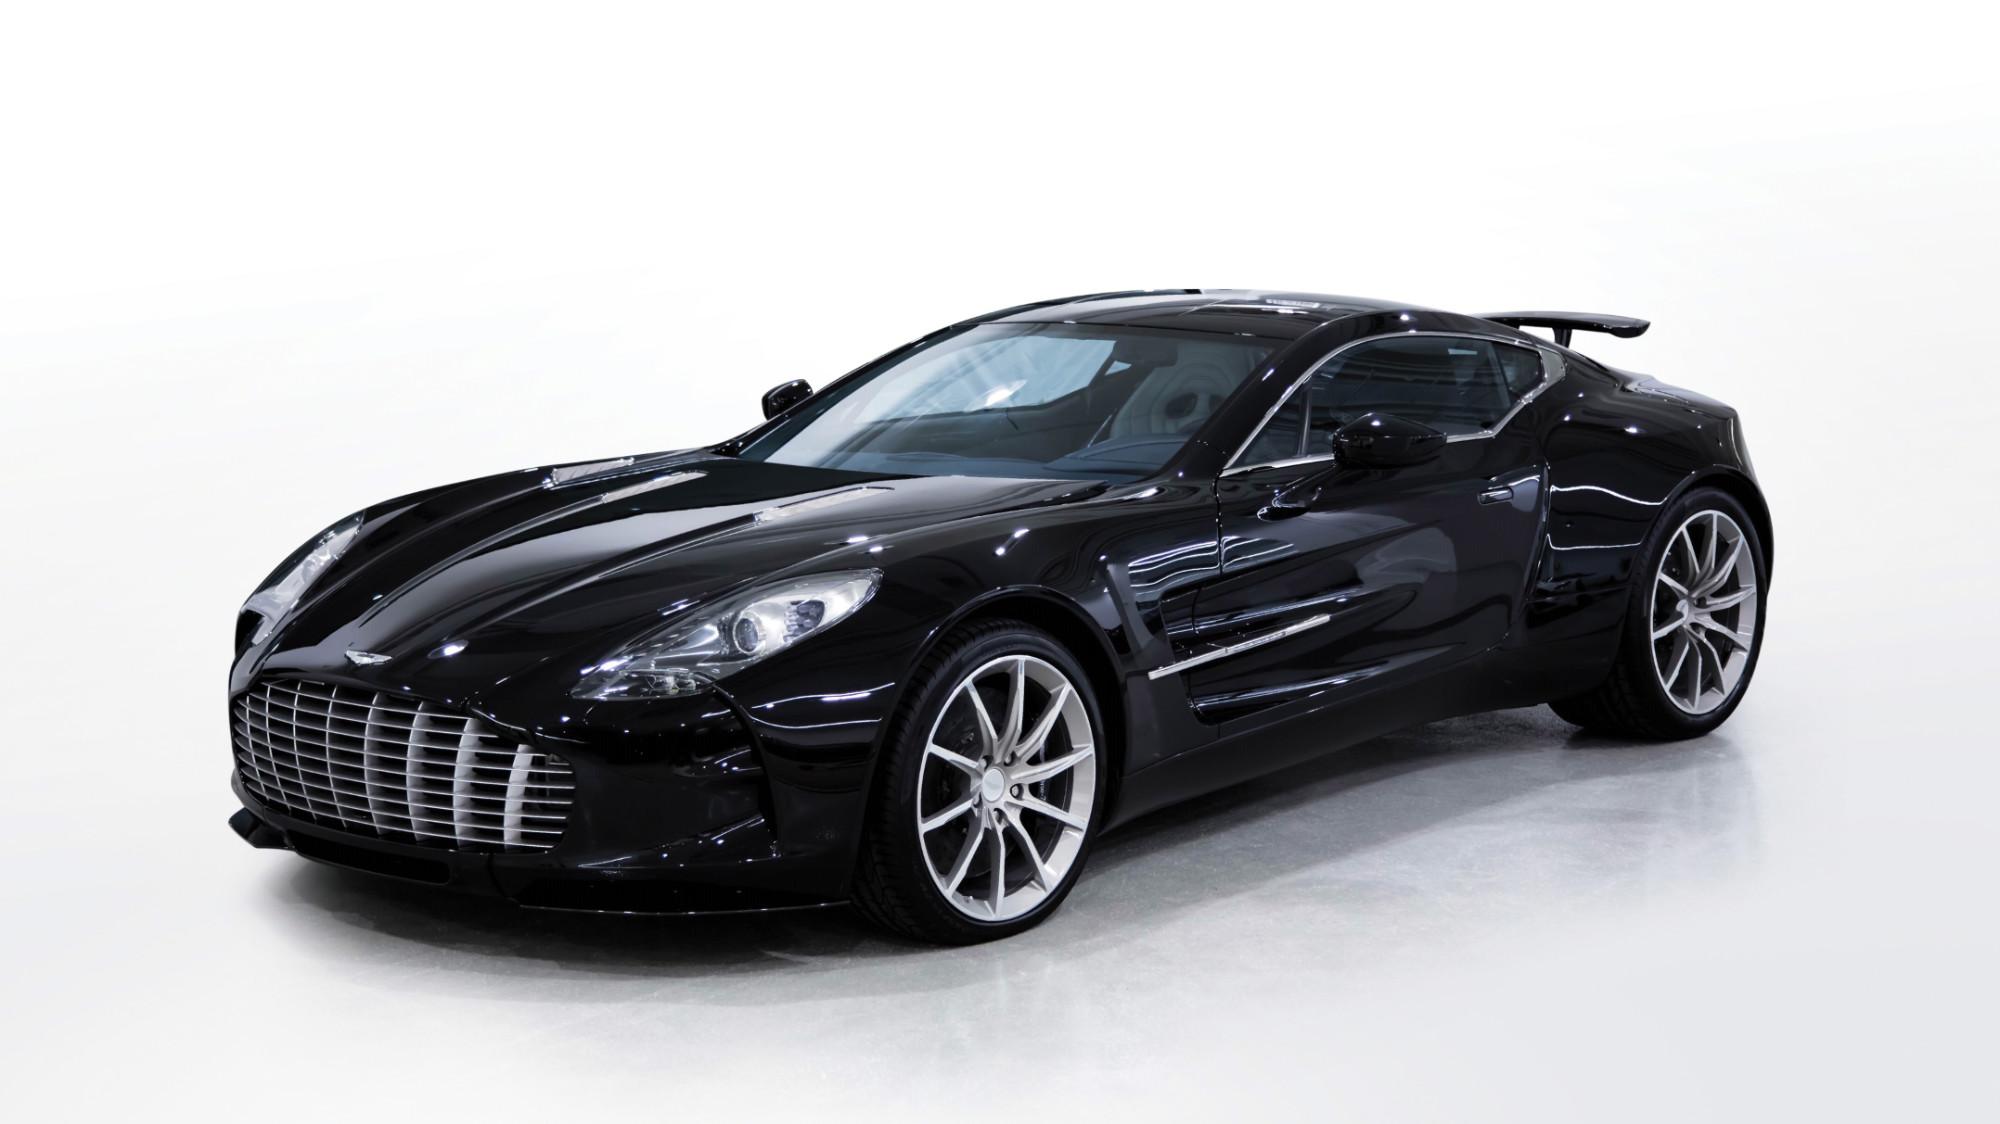 2019 Rm Sotheby S Abu Dhabi Sale Aston Martin One 77 Announcement Top Classic Car Auctions